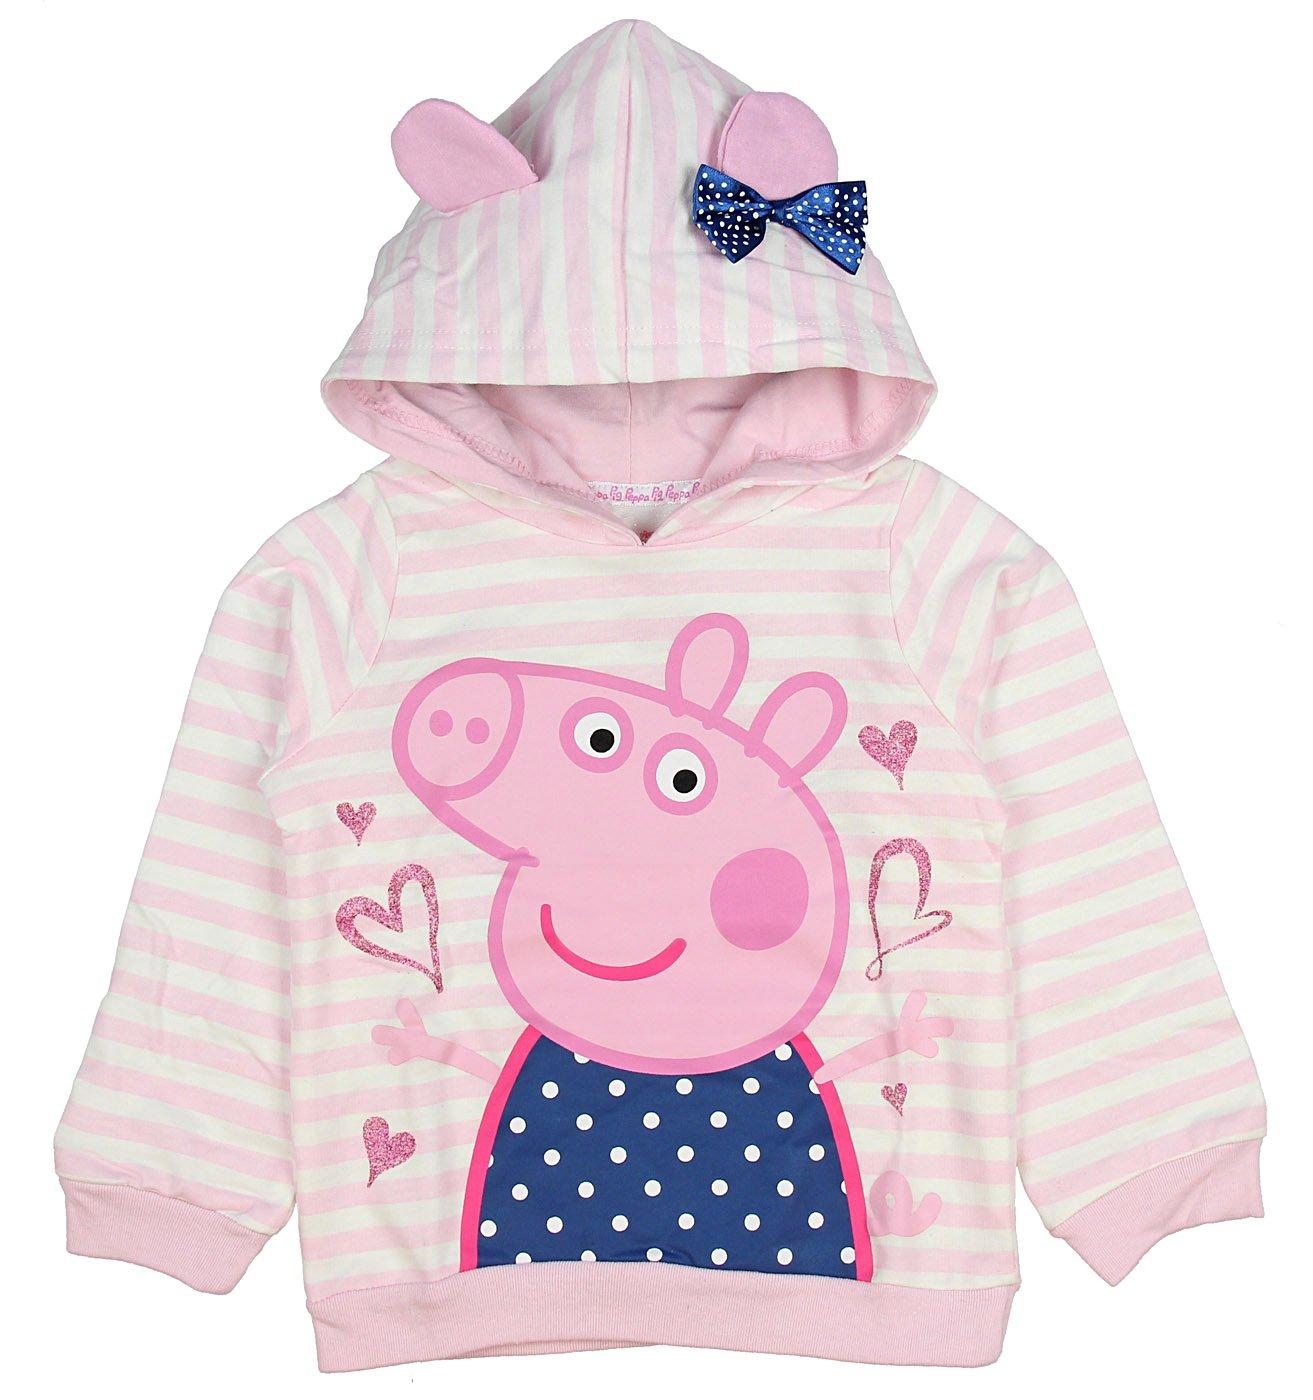 Peppa Pig Little Girls Toddler Lightweight Pullover Hoodie (5T)